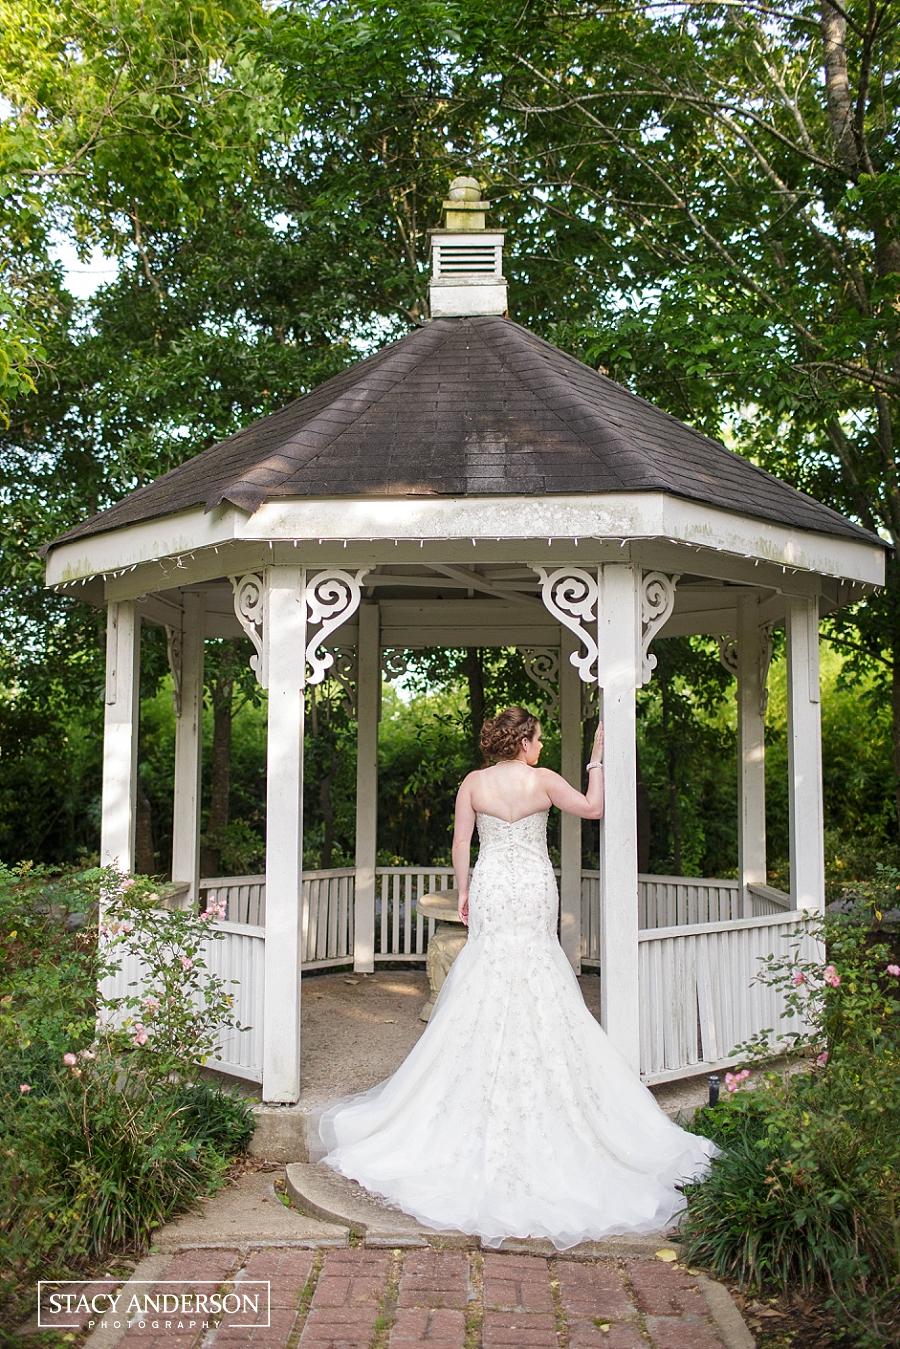 Stacy Anderson Photography Heaven on Earth Wedding Photographer_1700